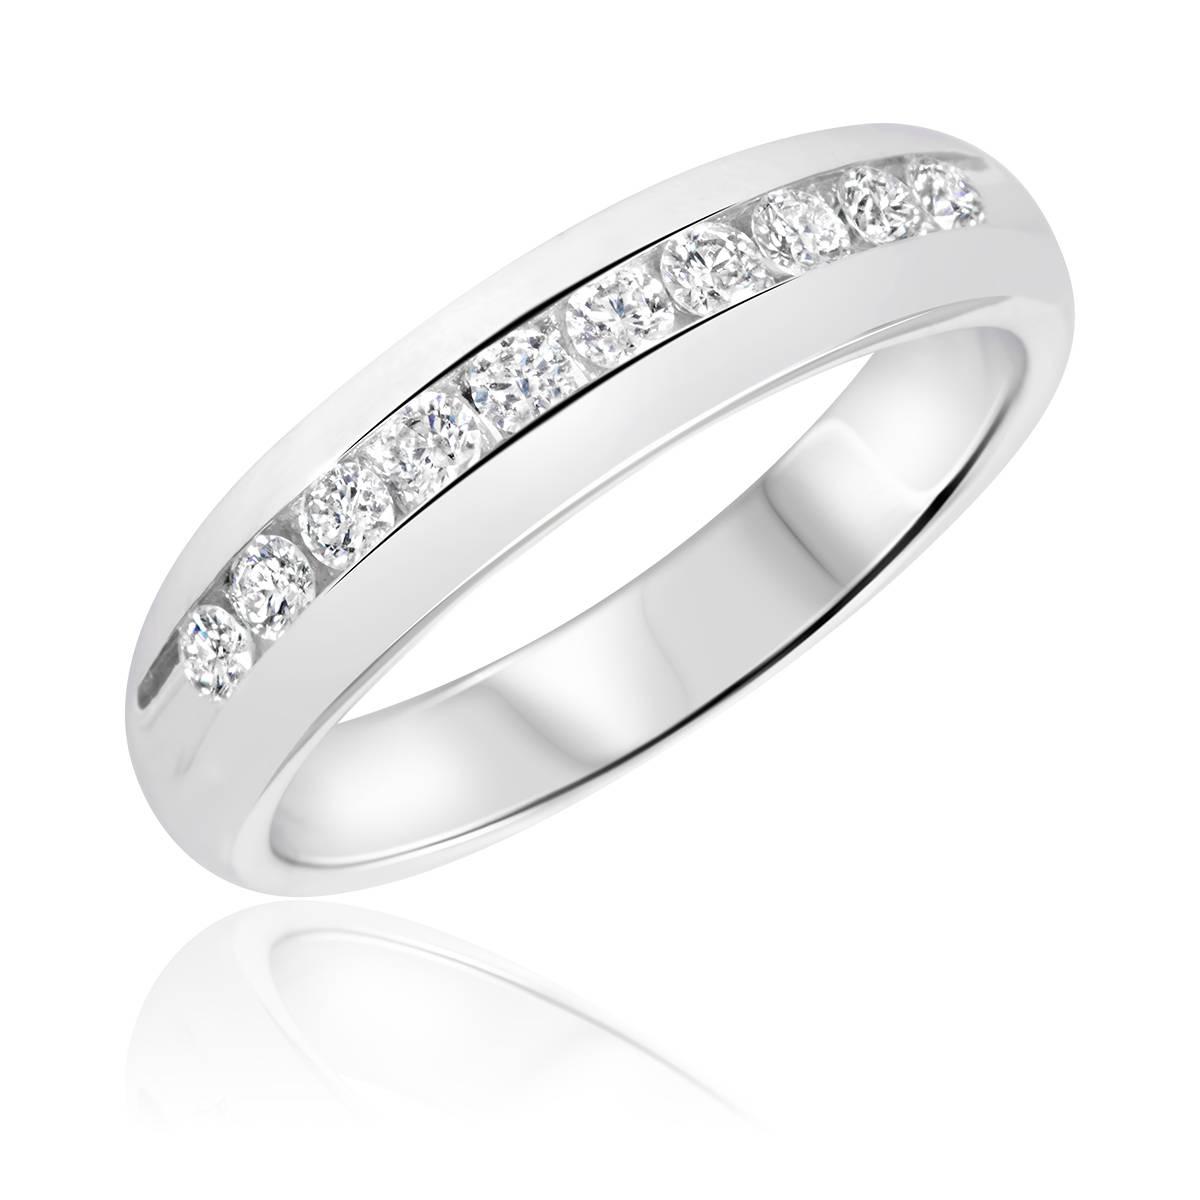 1/2 Carat T.w. Diamond Men's Wedding Ring 14K White Gold With Regard To 14 Carat Gold Wedding Bands (Gallery 2 of 15)